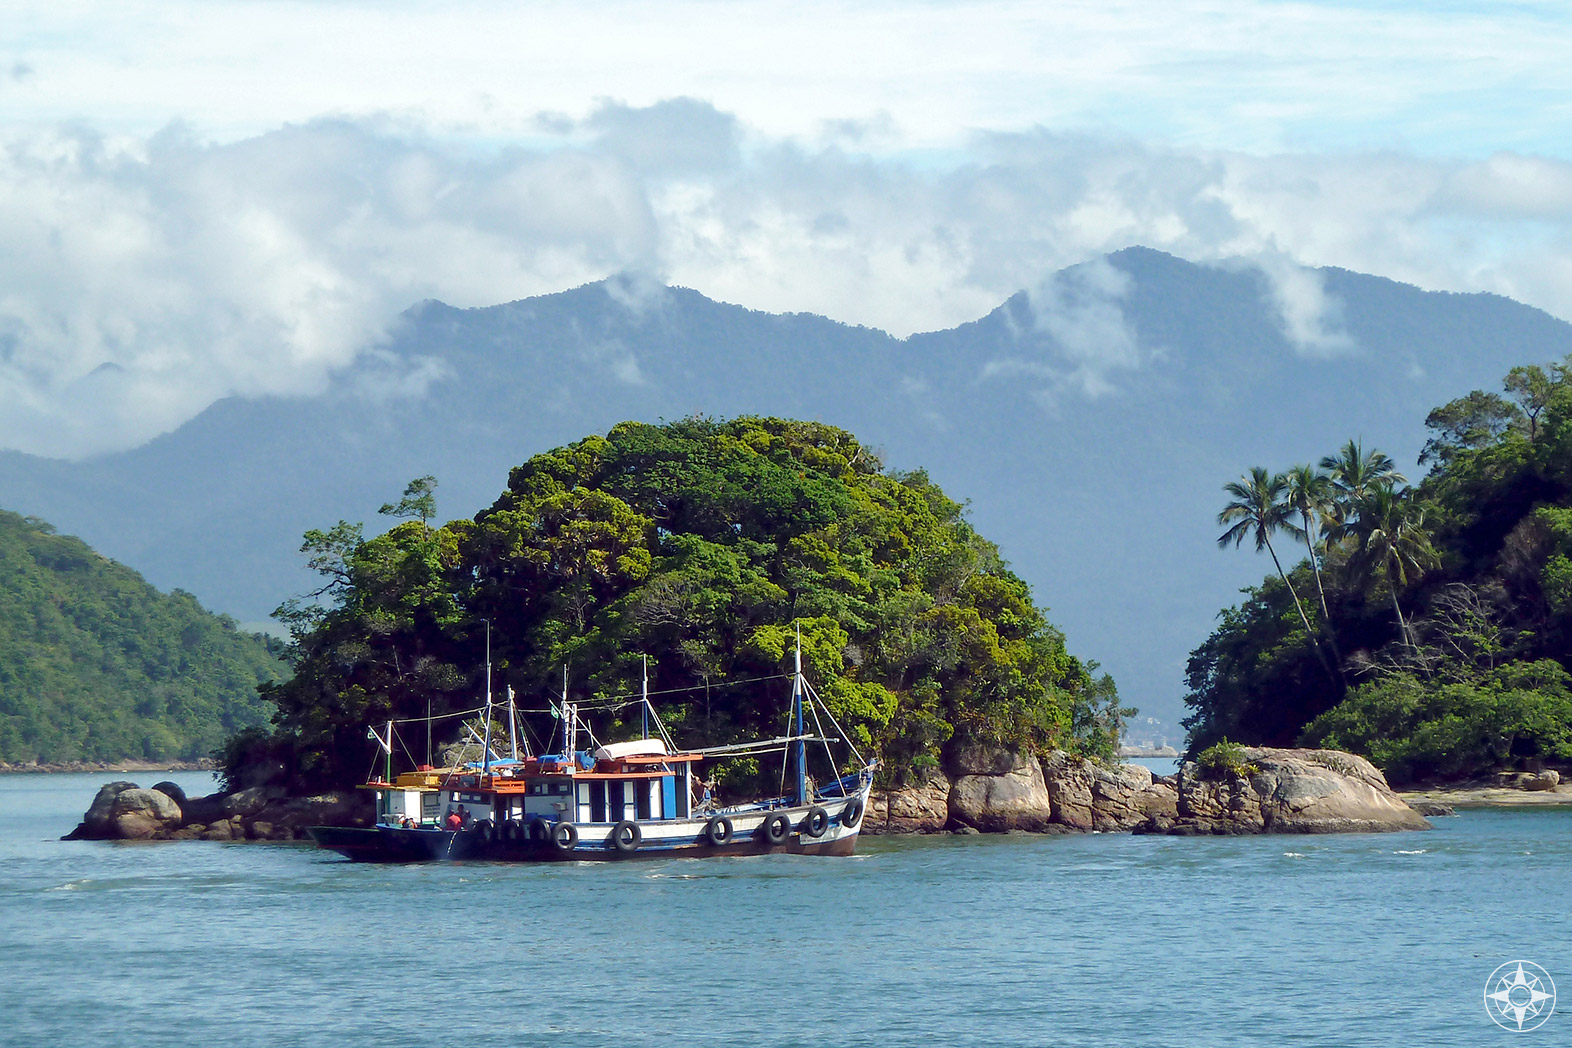 Fishing boats off Paradise island Ilha Grande in Brazil - Happier Place